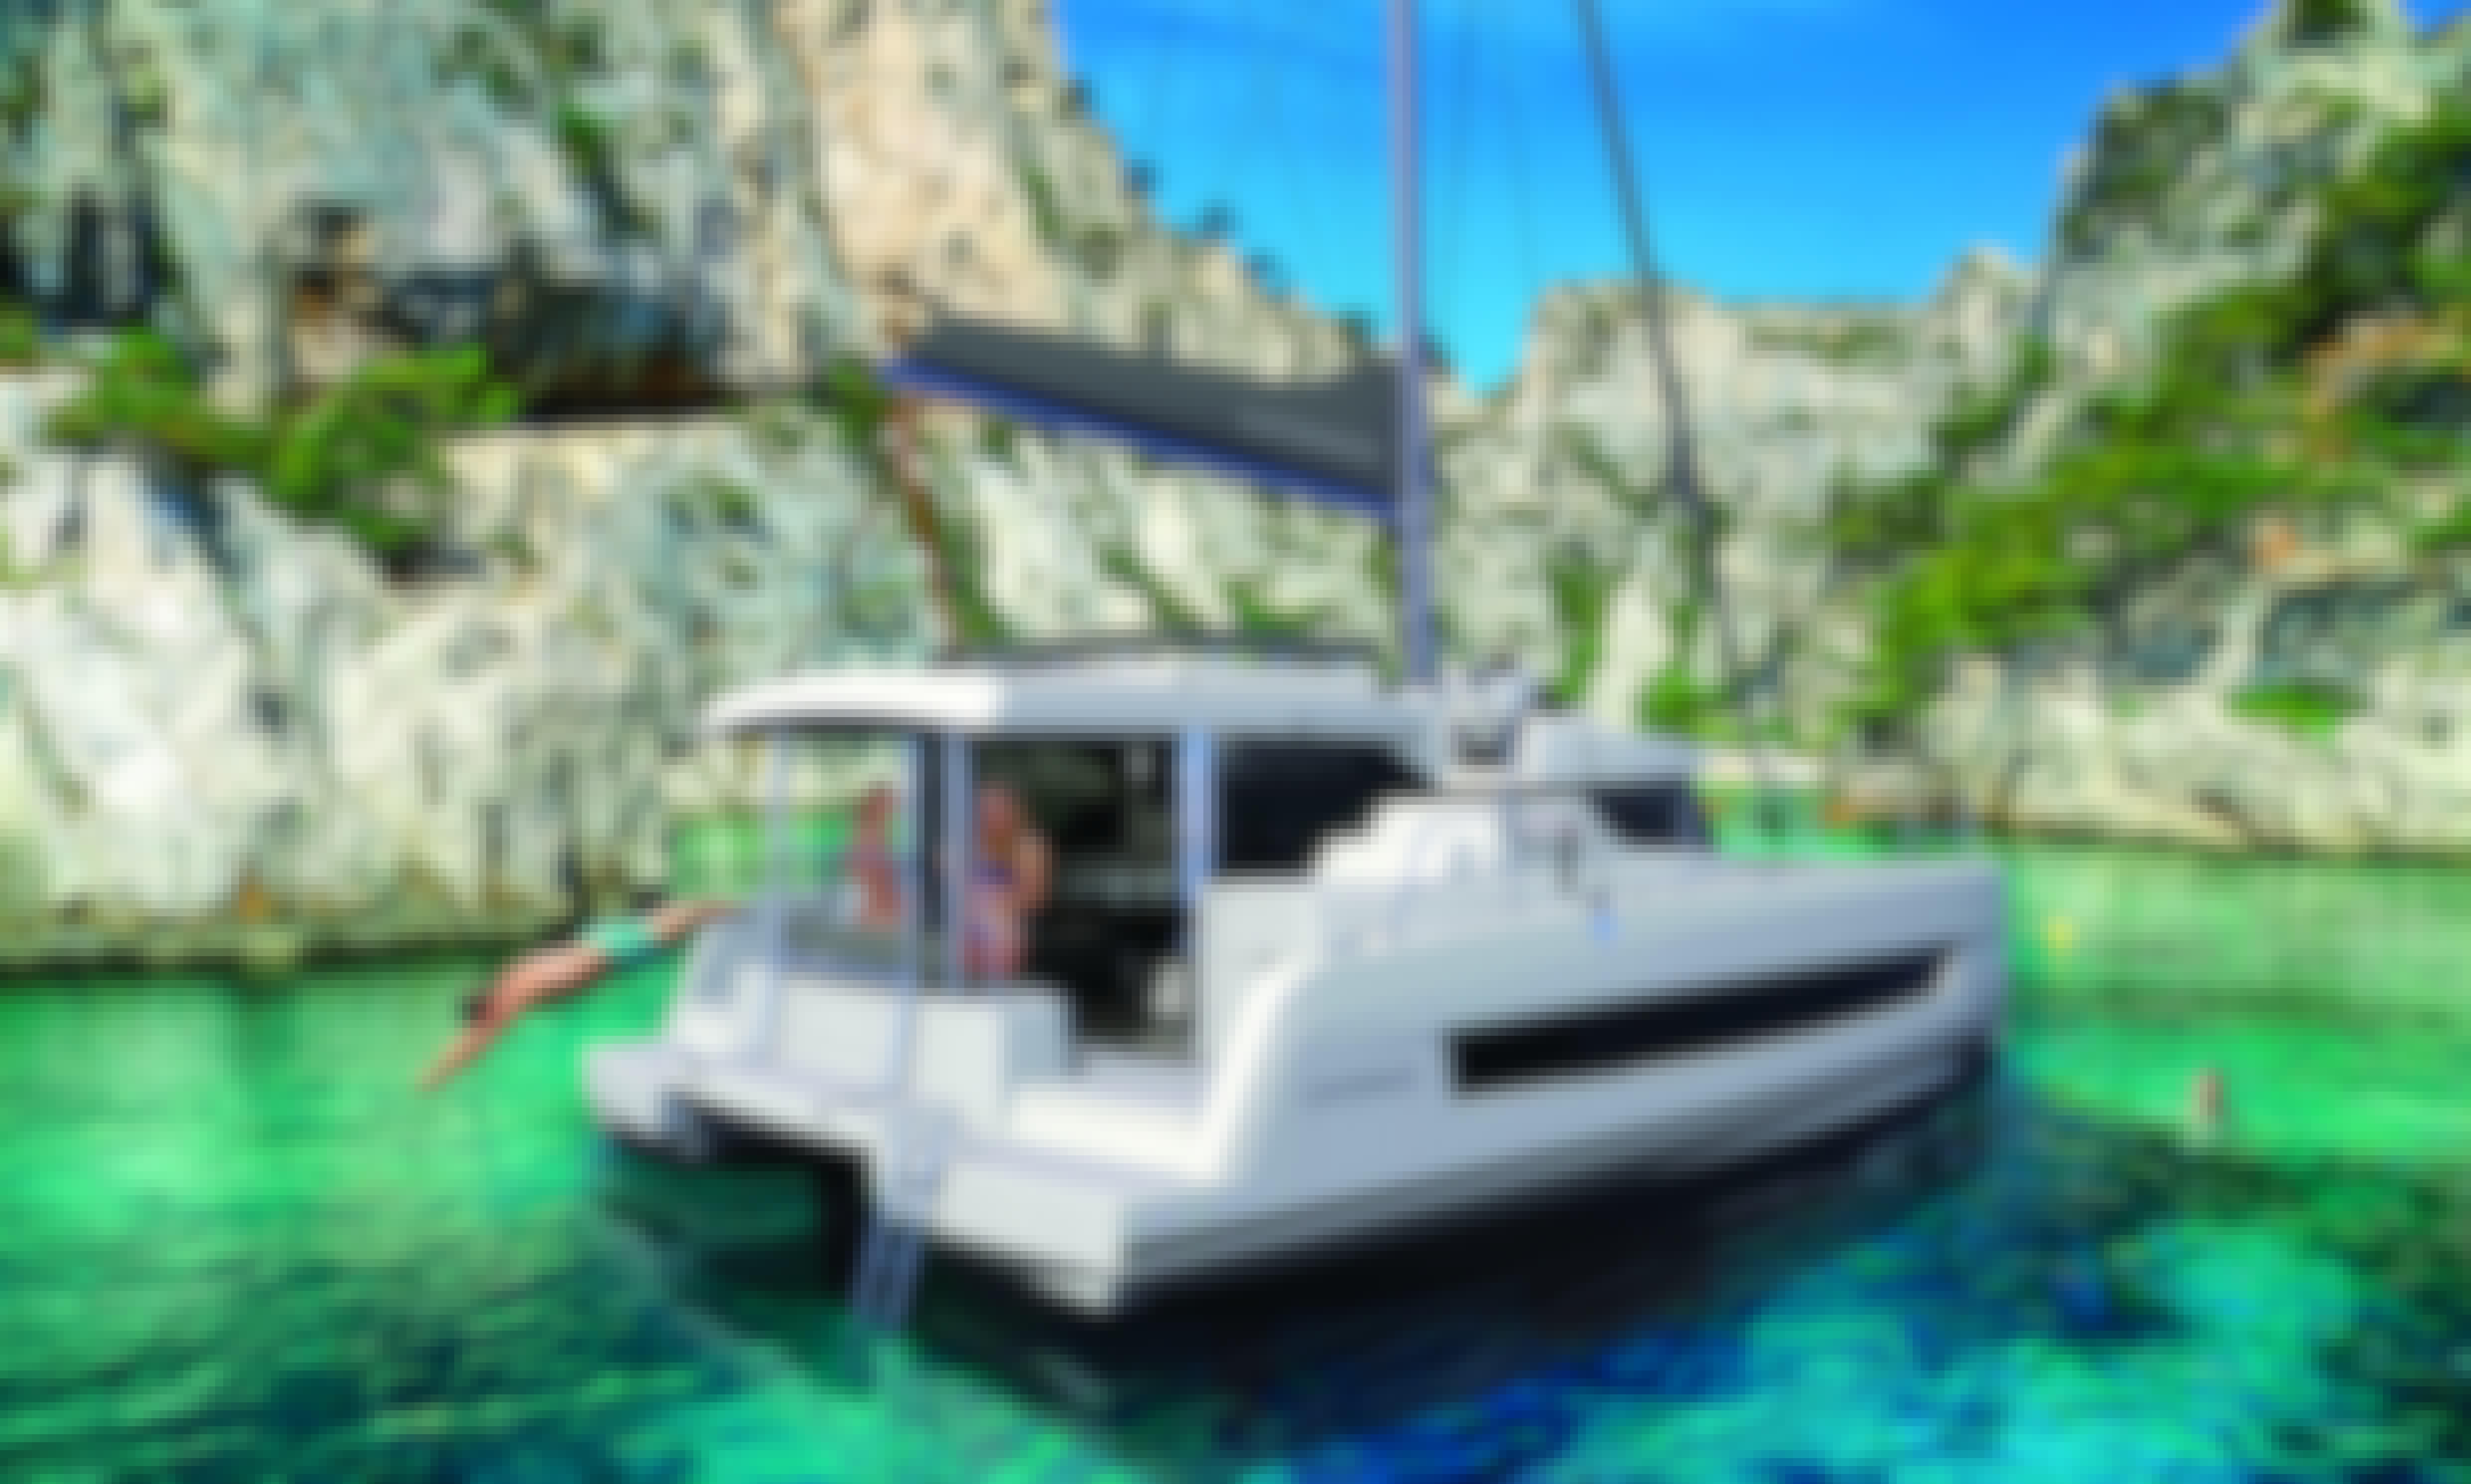 New Cruising Catamaran Rental! Bali Catspace 40ft available in Ibiza, Mallorca or Menorca (Balearic Islands)